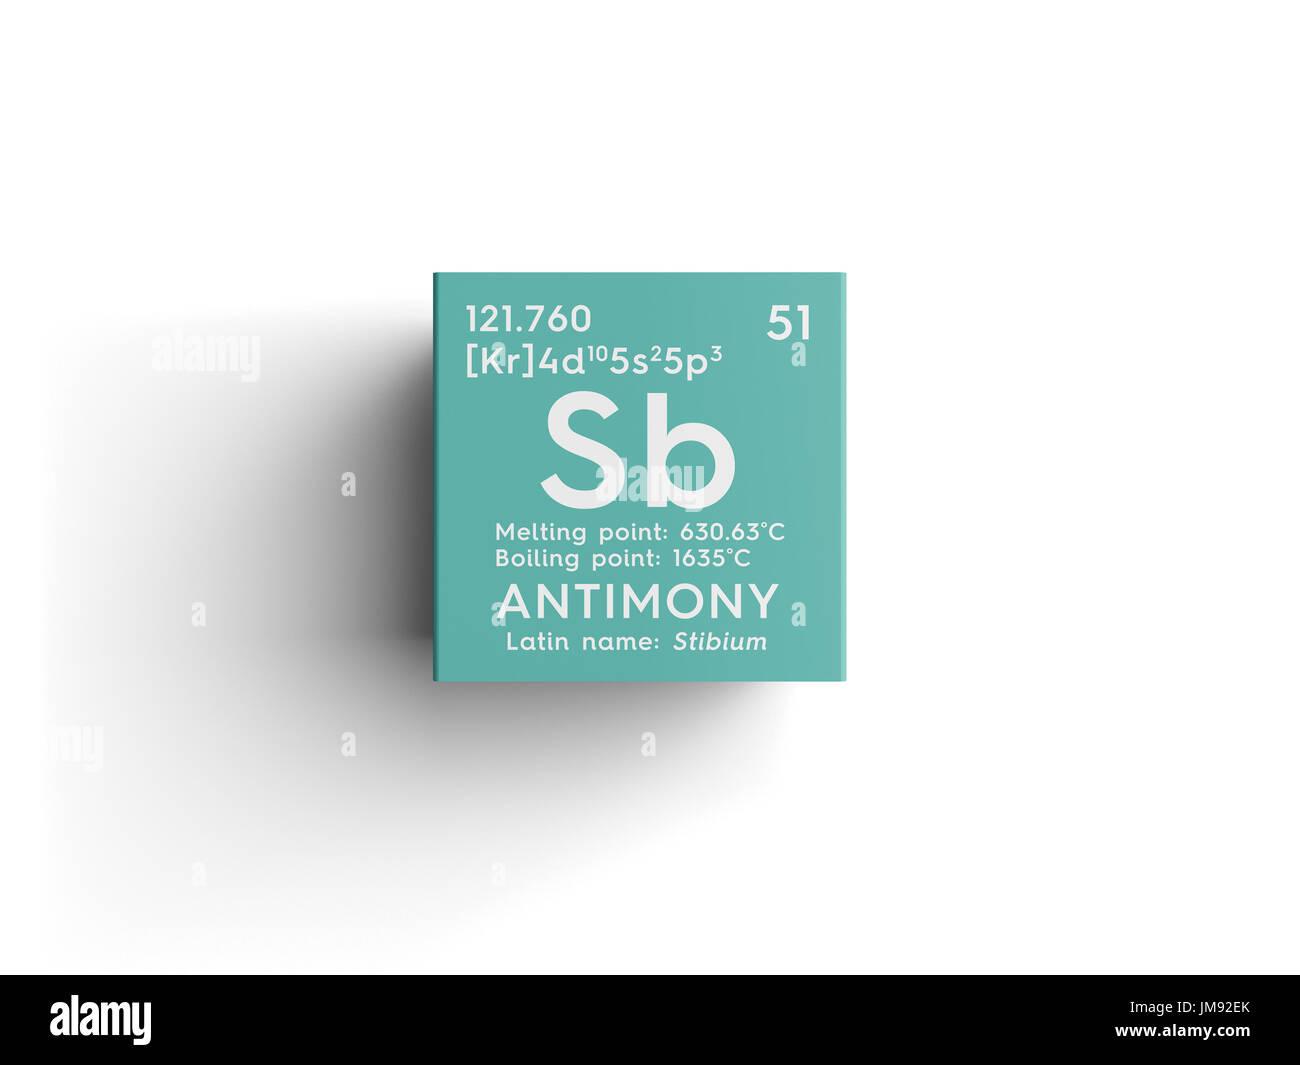 El antimonio stibium los metaloides elemento qumico de la tabla el antimonio stibium los metaloides elemento qumico de la tabla peridica de mendeleyev antimonio en square cube concepto creativo urtaz Gallery